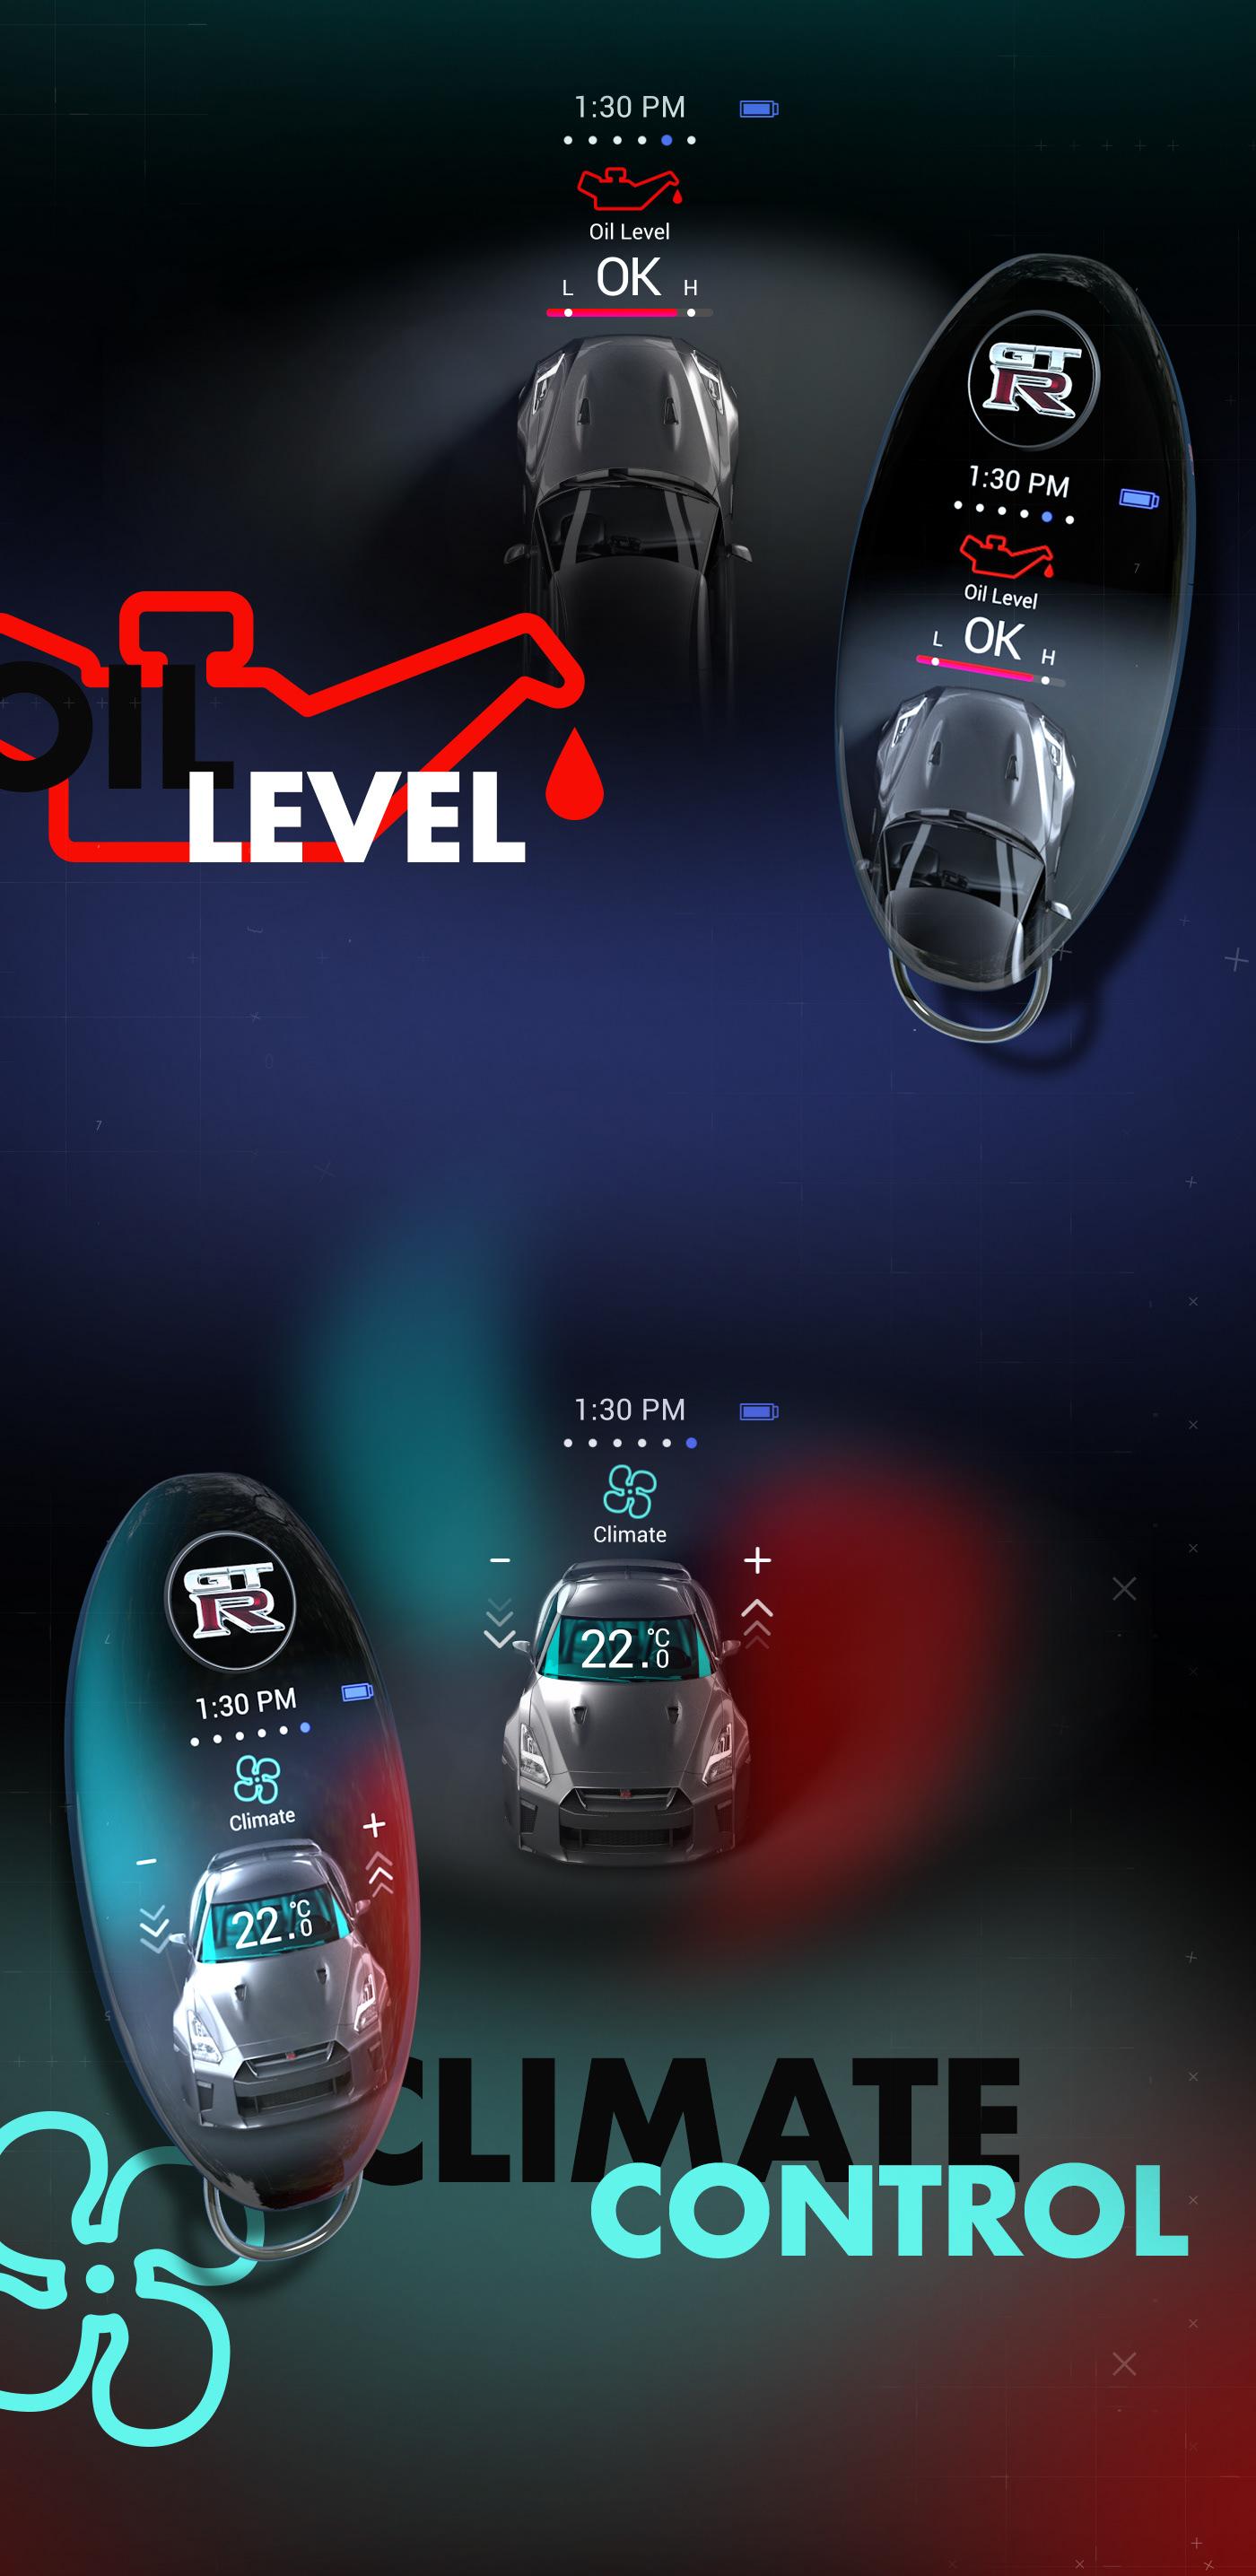 ux UI Interaction design  motion smart key user interface Wearable wireless key fob car